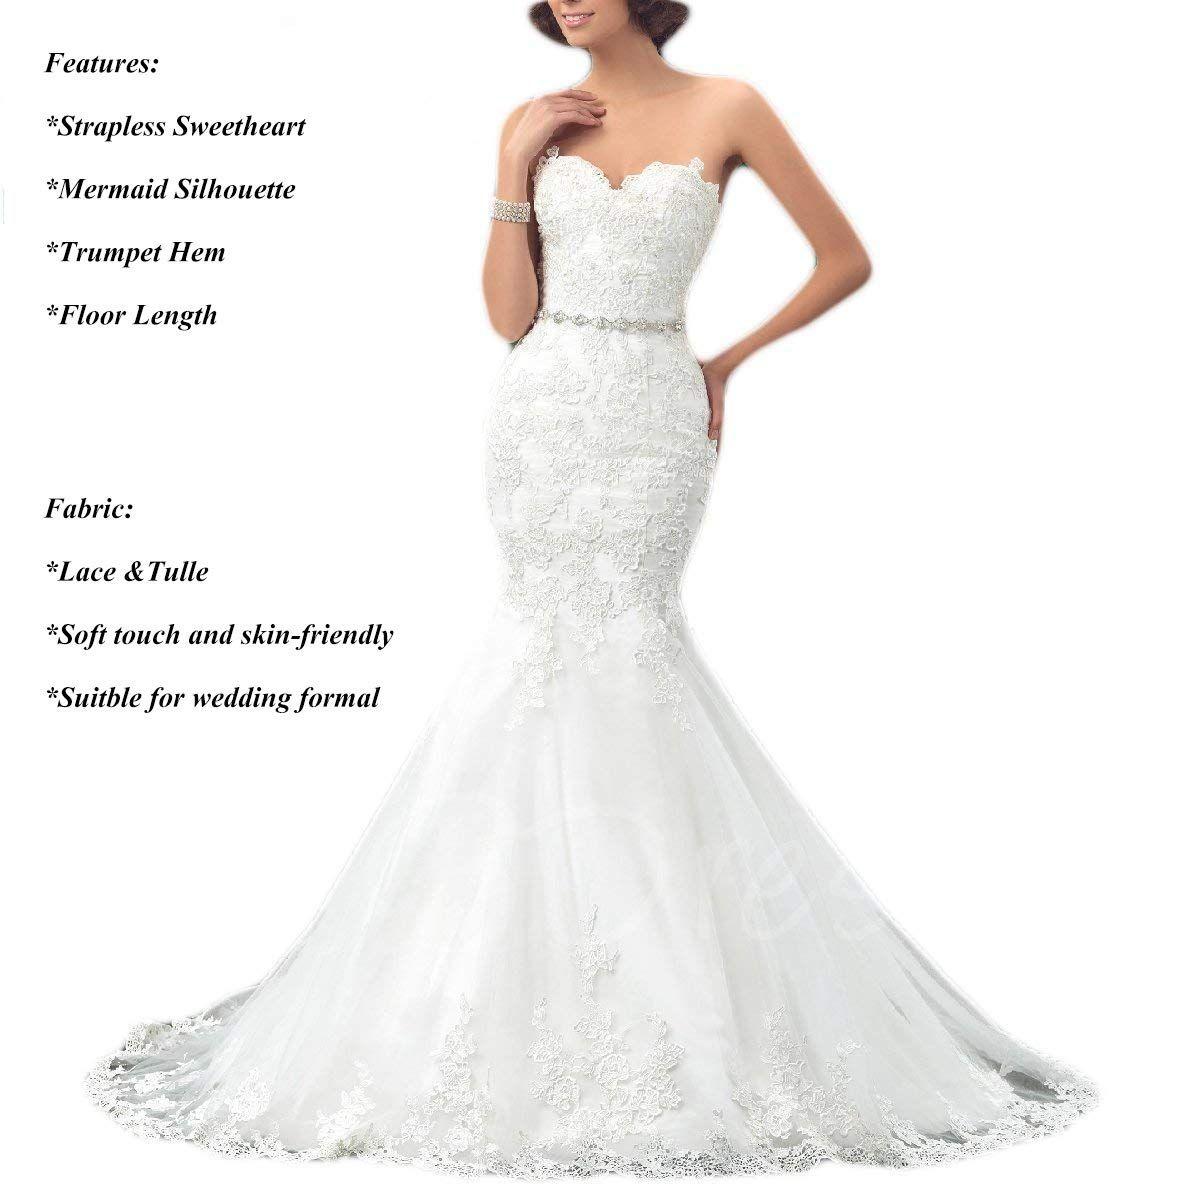 Oyisha Womens Sweetheart Mermaid Wedding Dress Beaded Bridal Dresses Long Wd162 Ivory Bridal Dresses Lace Lace Mermaid Wedding Dress Classic Wedding Dress Lace [ 1200 x 1200 Pixel ]